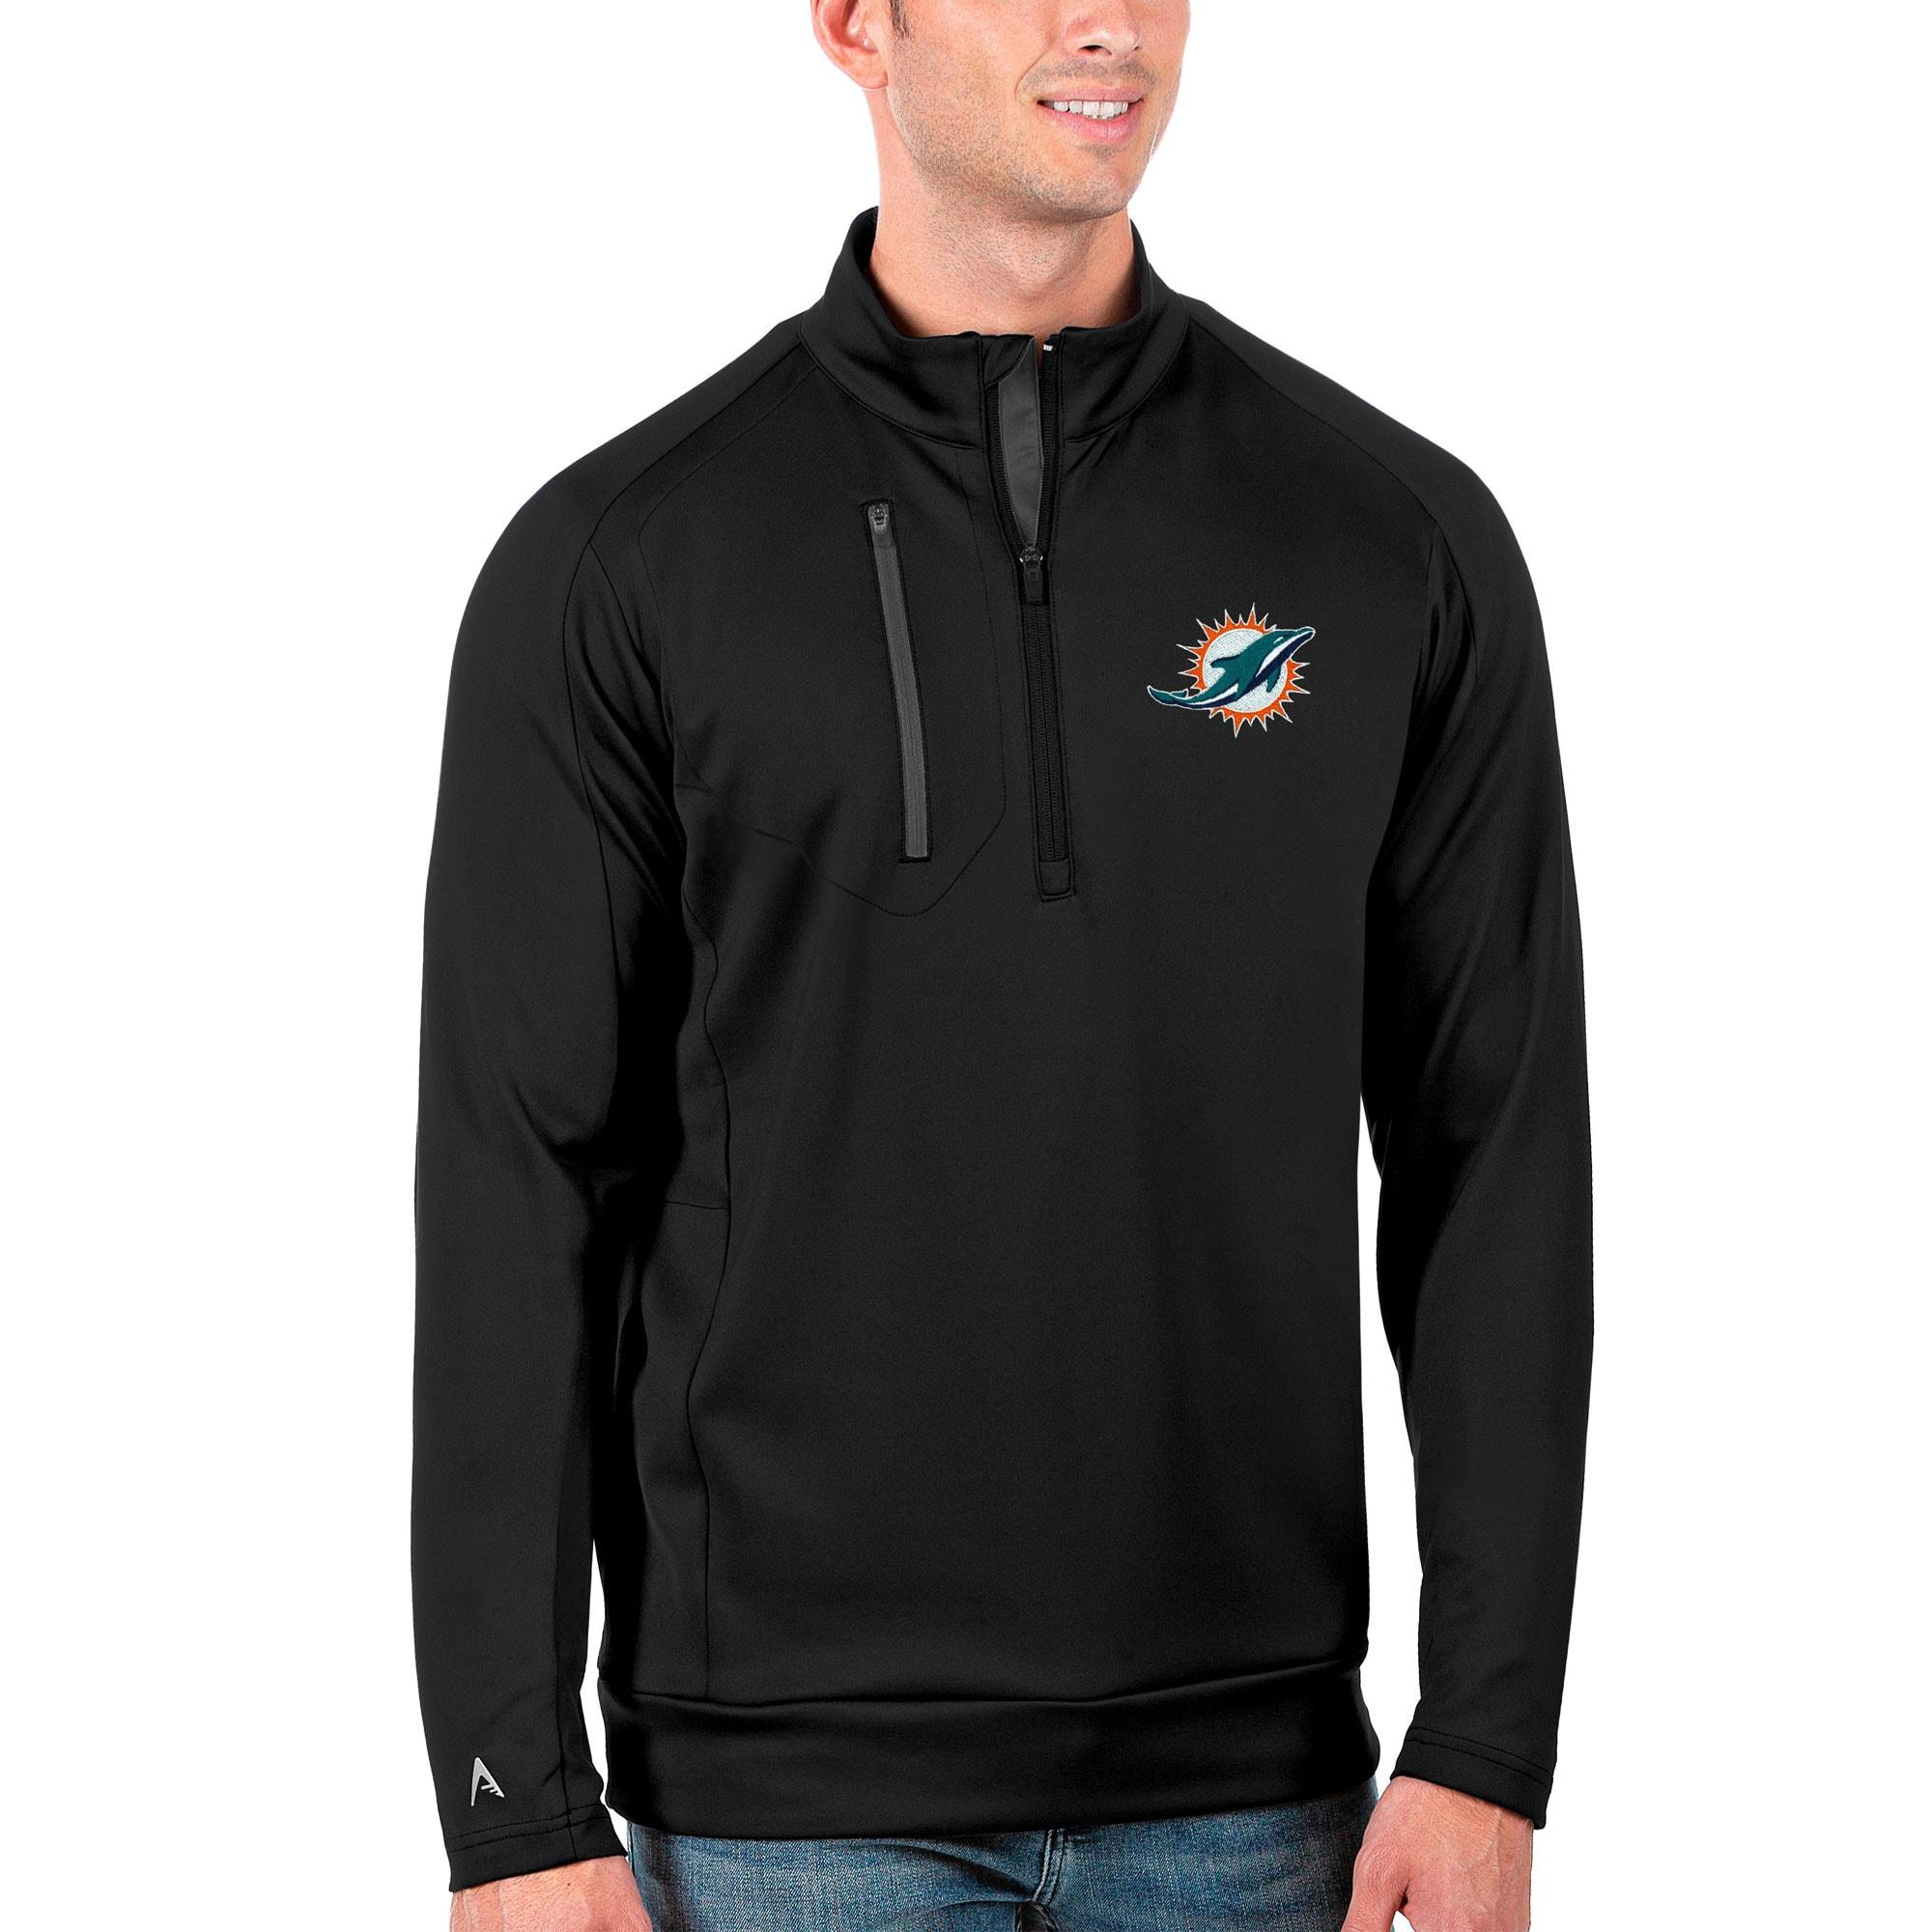 Miami Dolphins Antigua Generation Quarter-Zip Pullover Jacket - Black/Charcoal